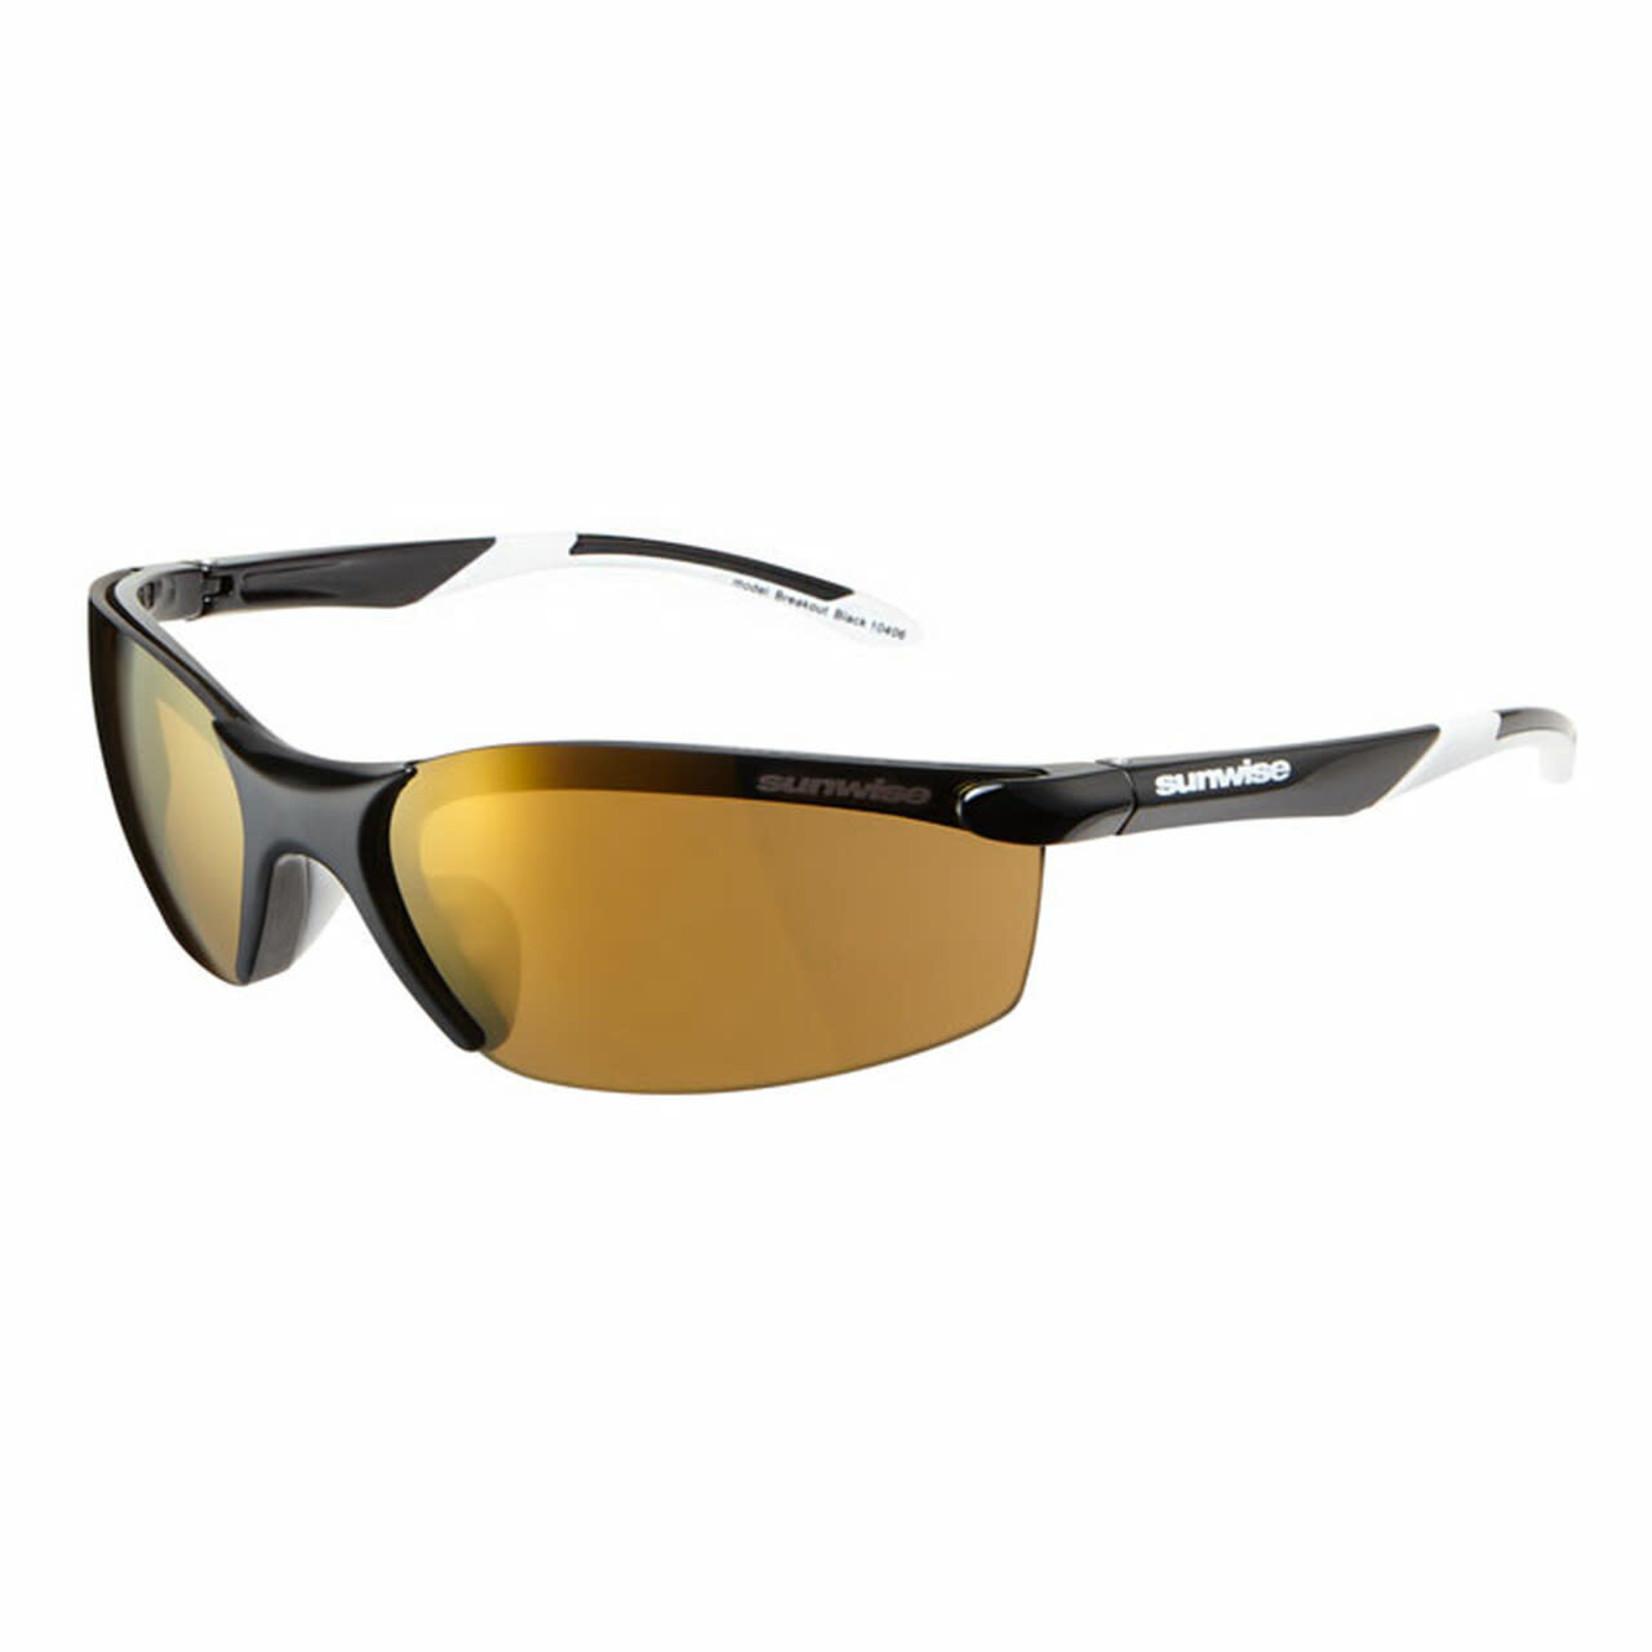 Sunwise Breakout Sunglasses Black/White